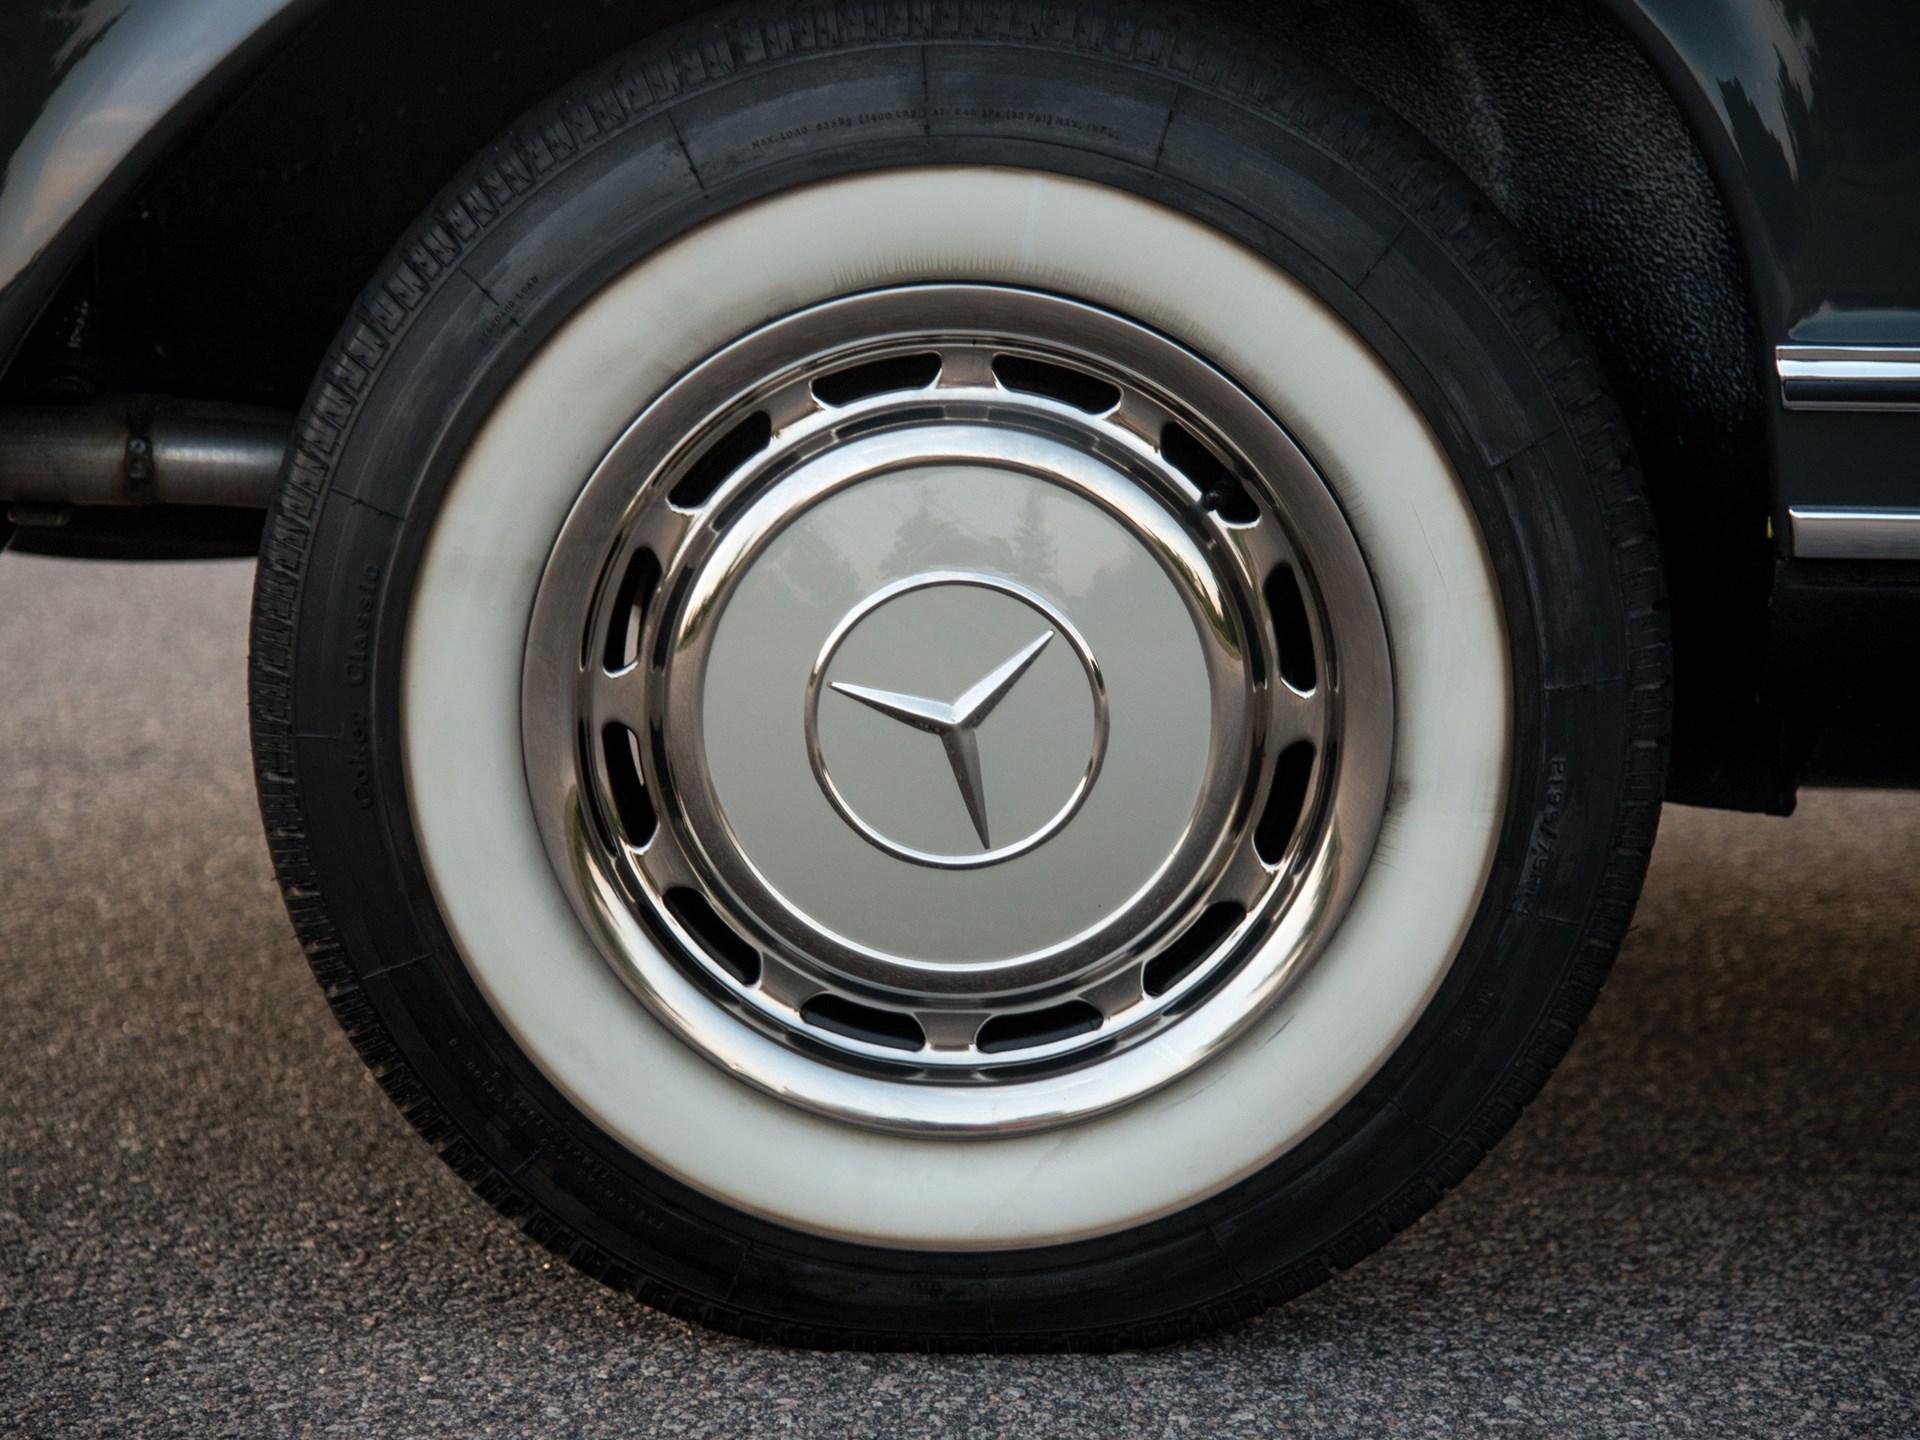 1968 Mercedes-Benz 250 SL 'Pagoda'